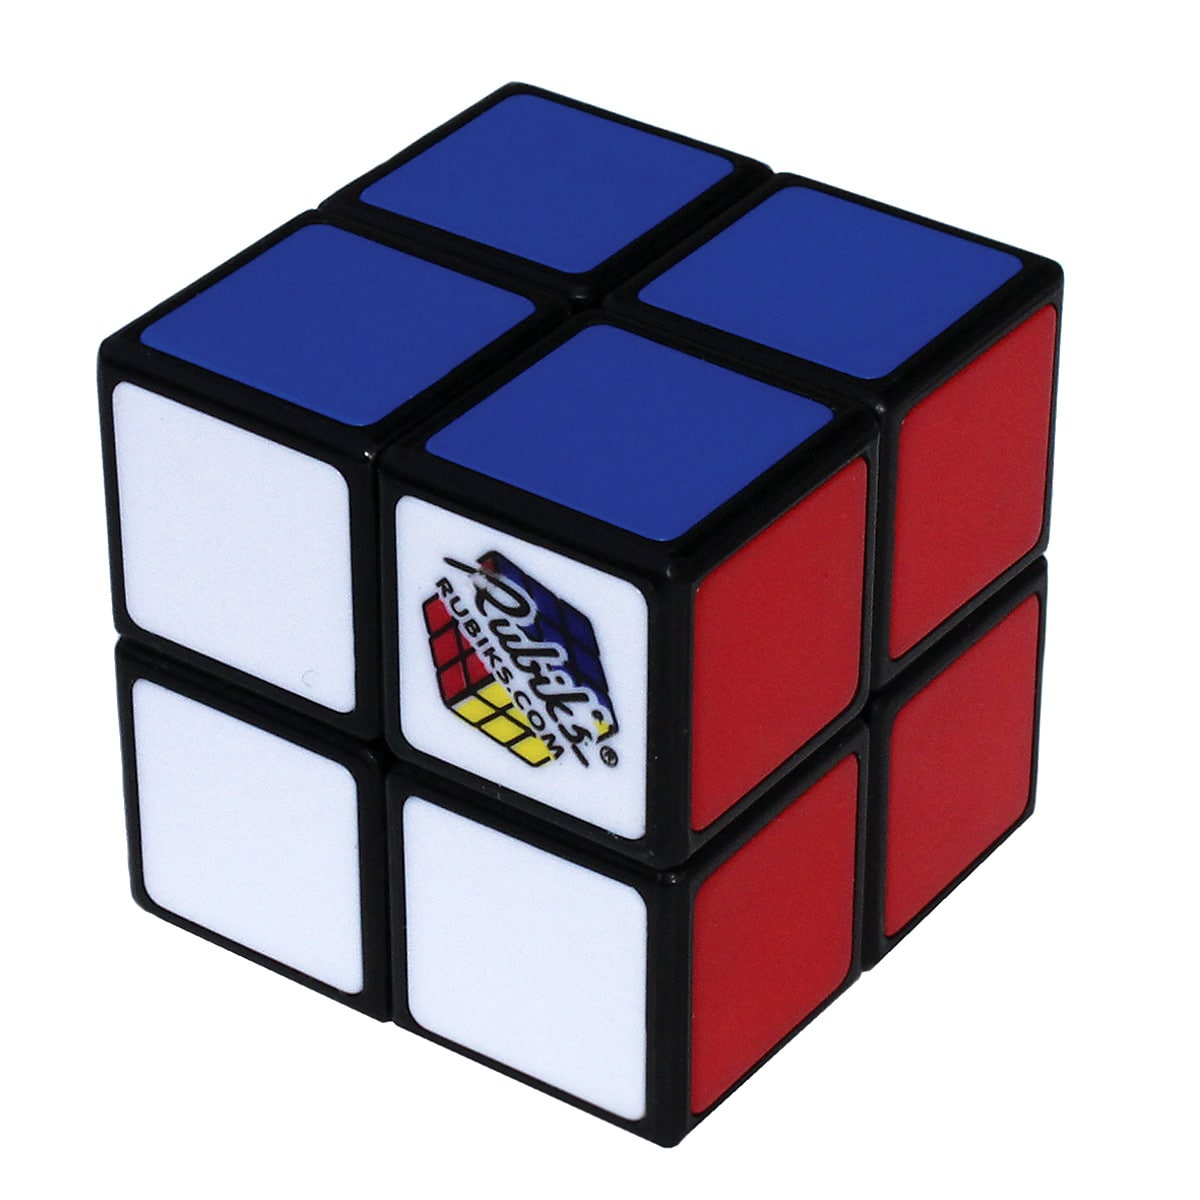 Rubikin kuutio 2x2